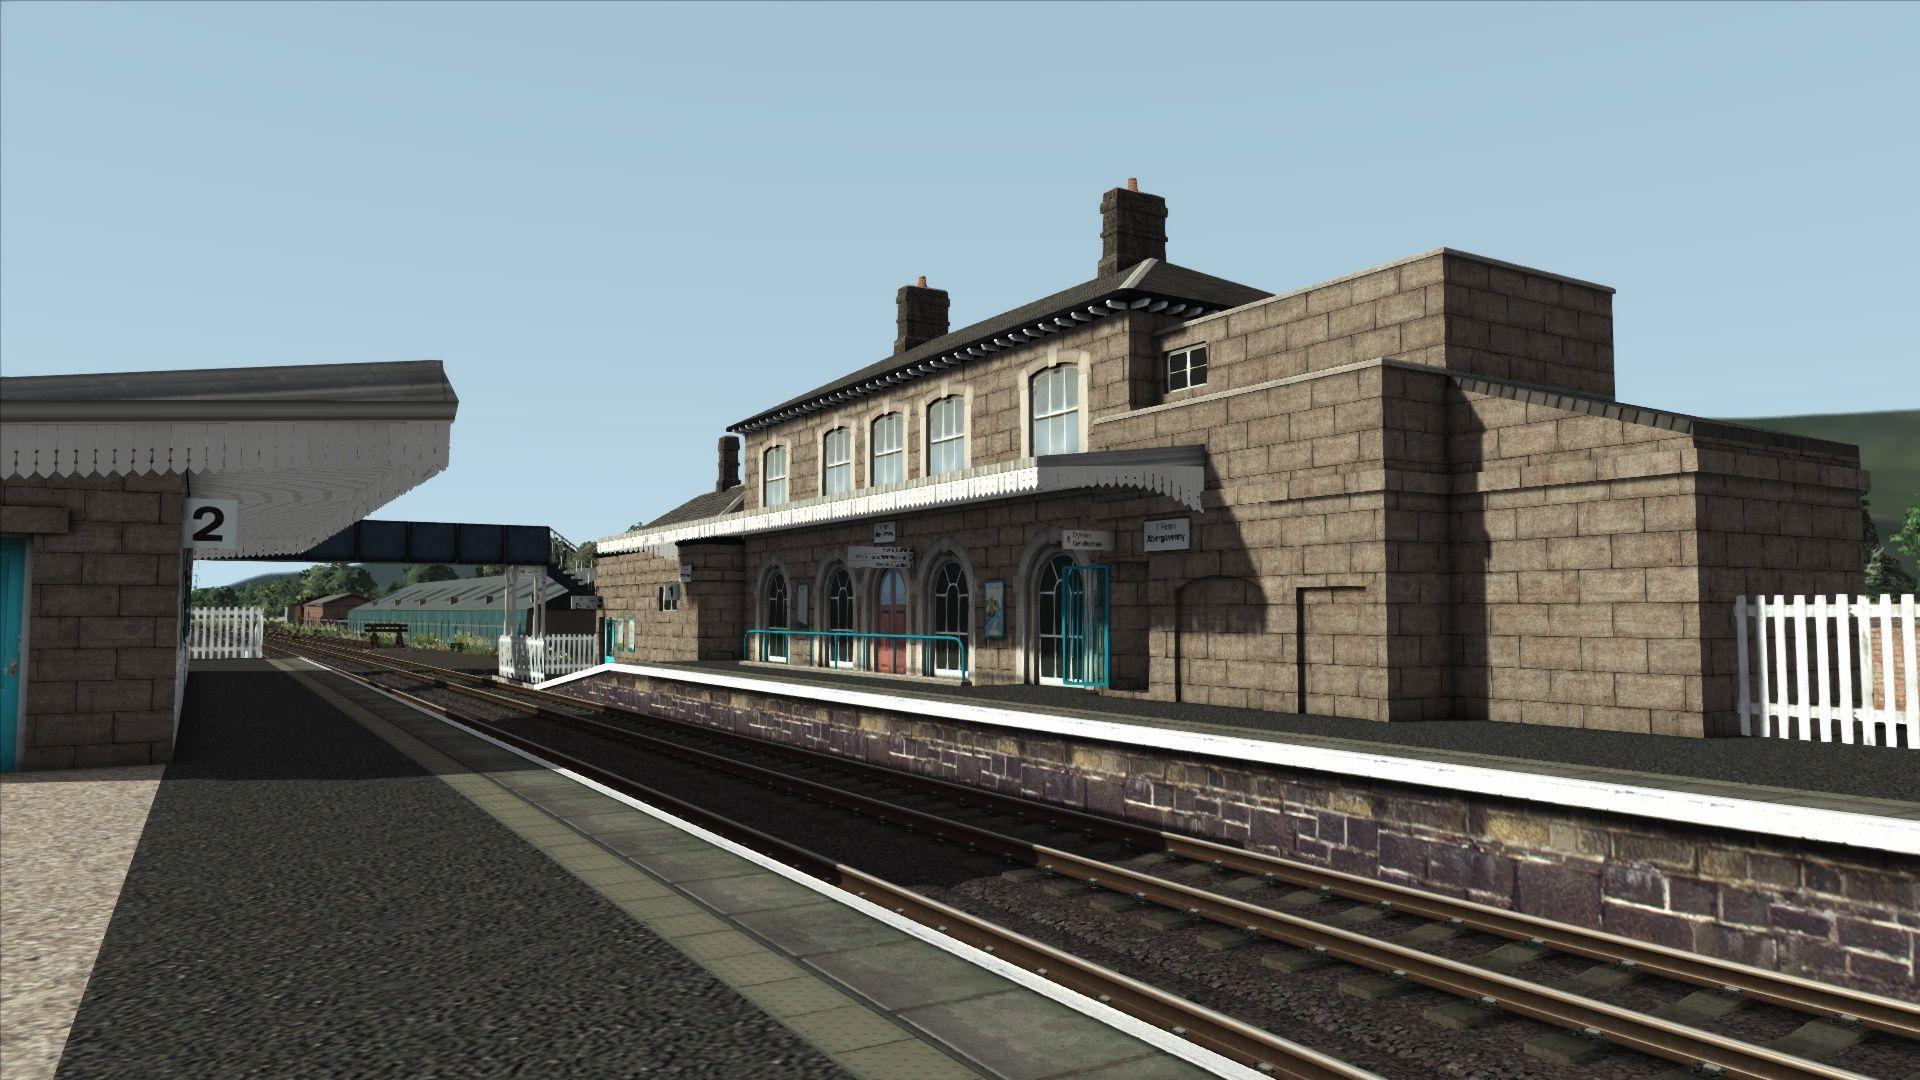 Screenshot_[BMG] Welsh Marches Line - Newport to Shrewsbury_51.81736--3.008